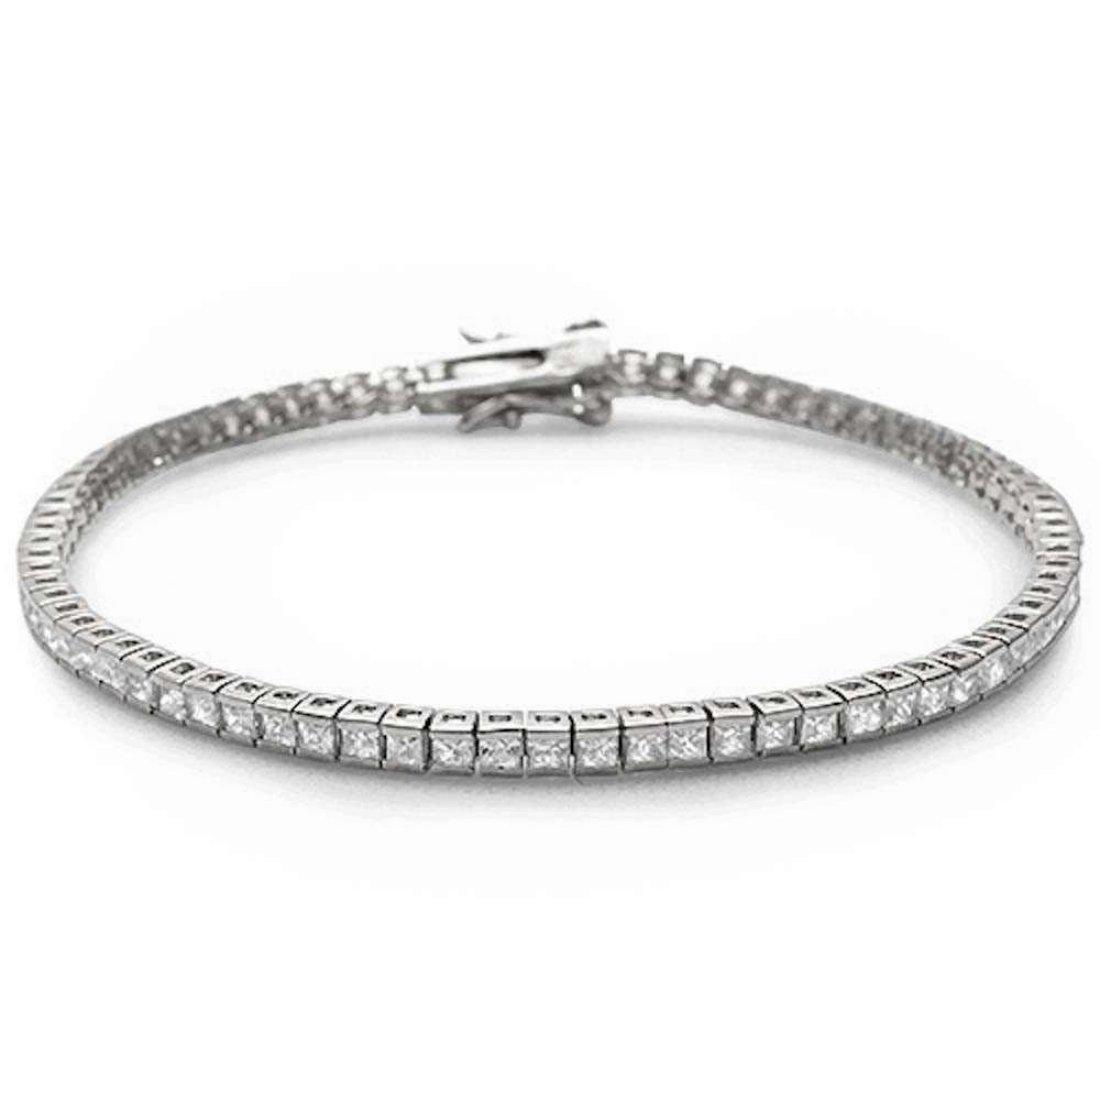 Half Bezel Tennis Bracelet 7'' Princess Cut Square Simulated Cubic Zirconia 925 Sterling Silver